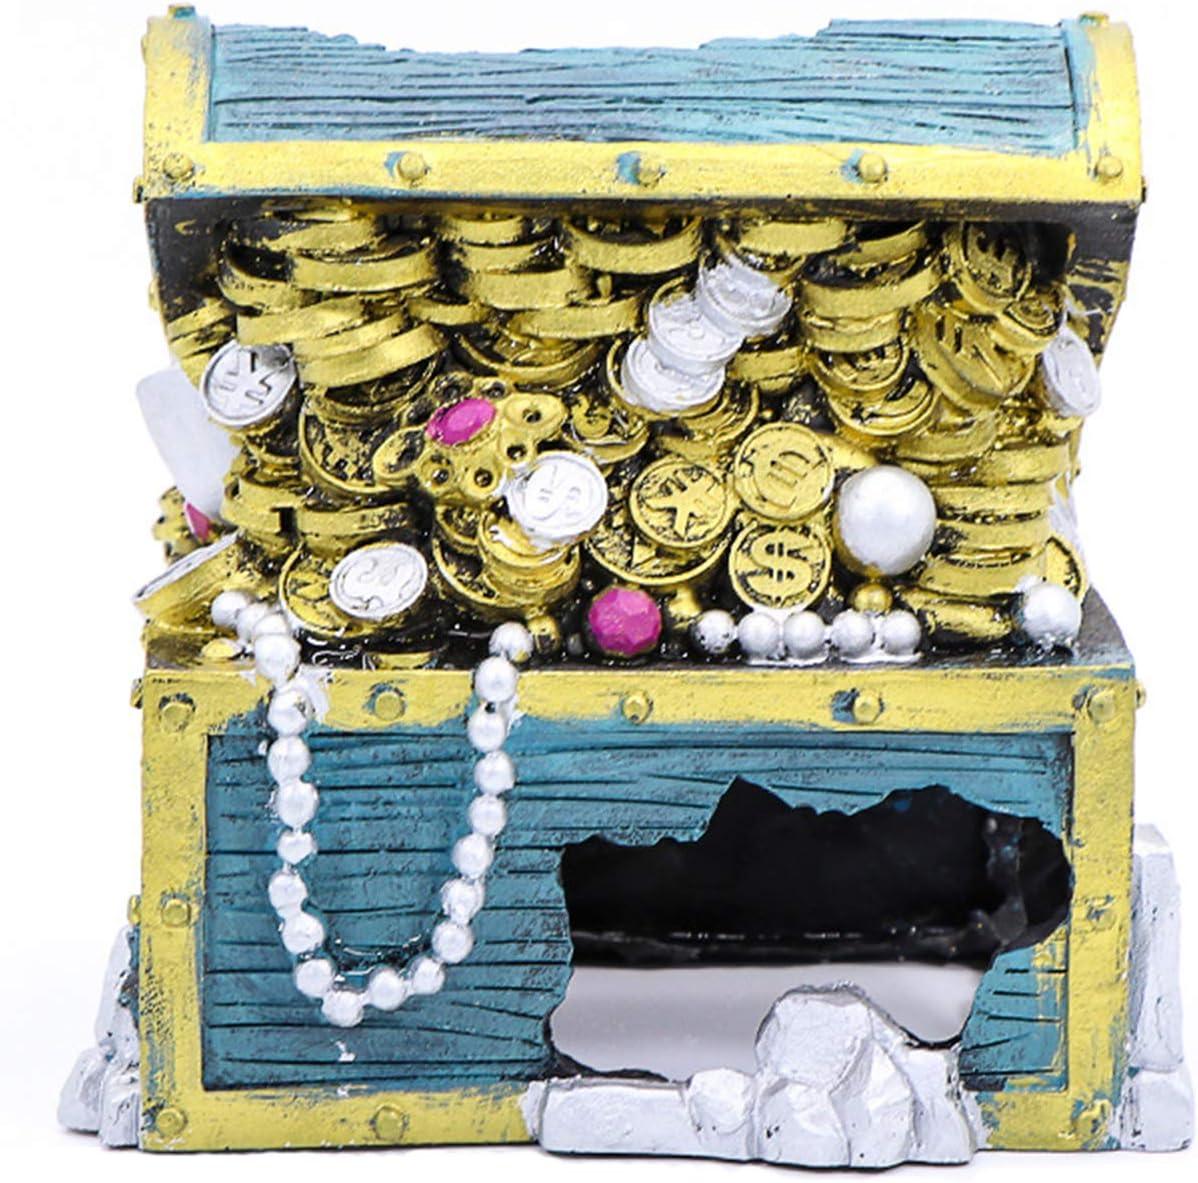 Gold Coin Treasure Chest Fish Tank Ornament Resin Aquarium Accessories for Small Shrimp Turtle Fish Tank